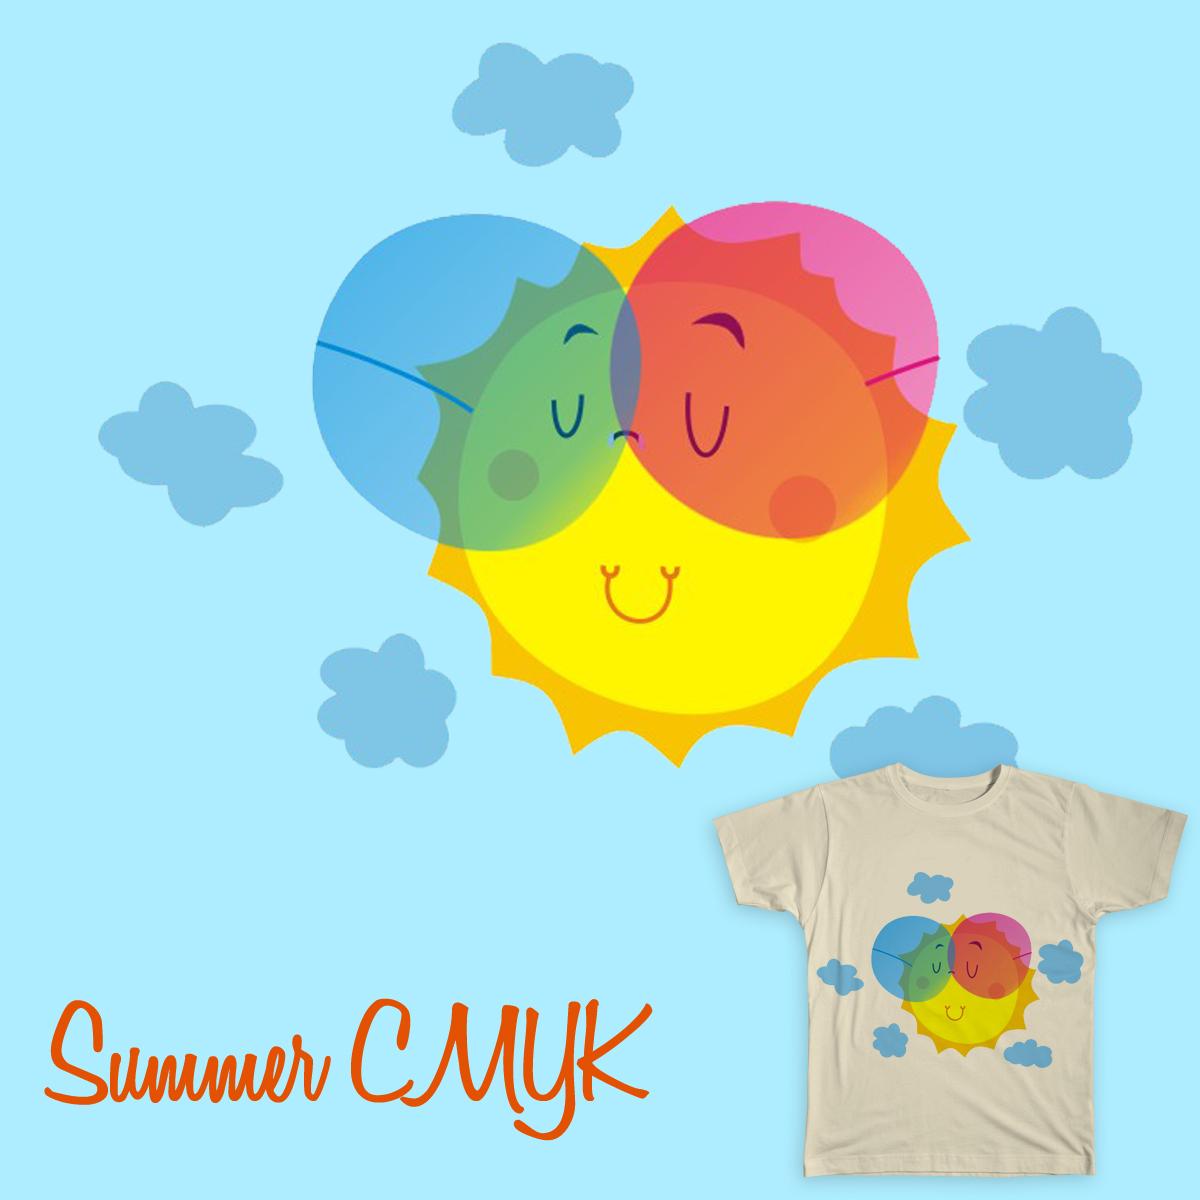 summerCMYK by latinlover on Threadless